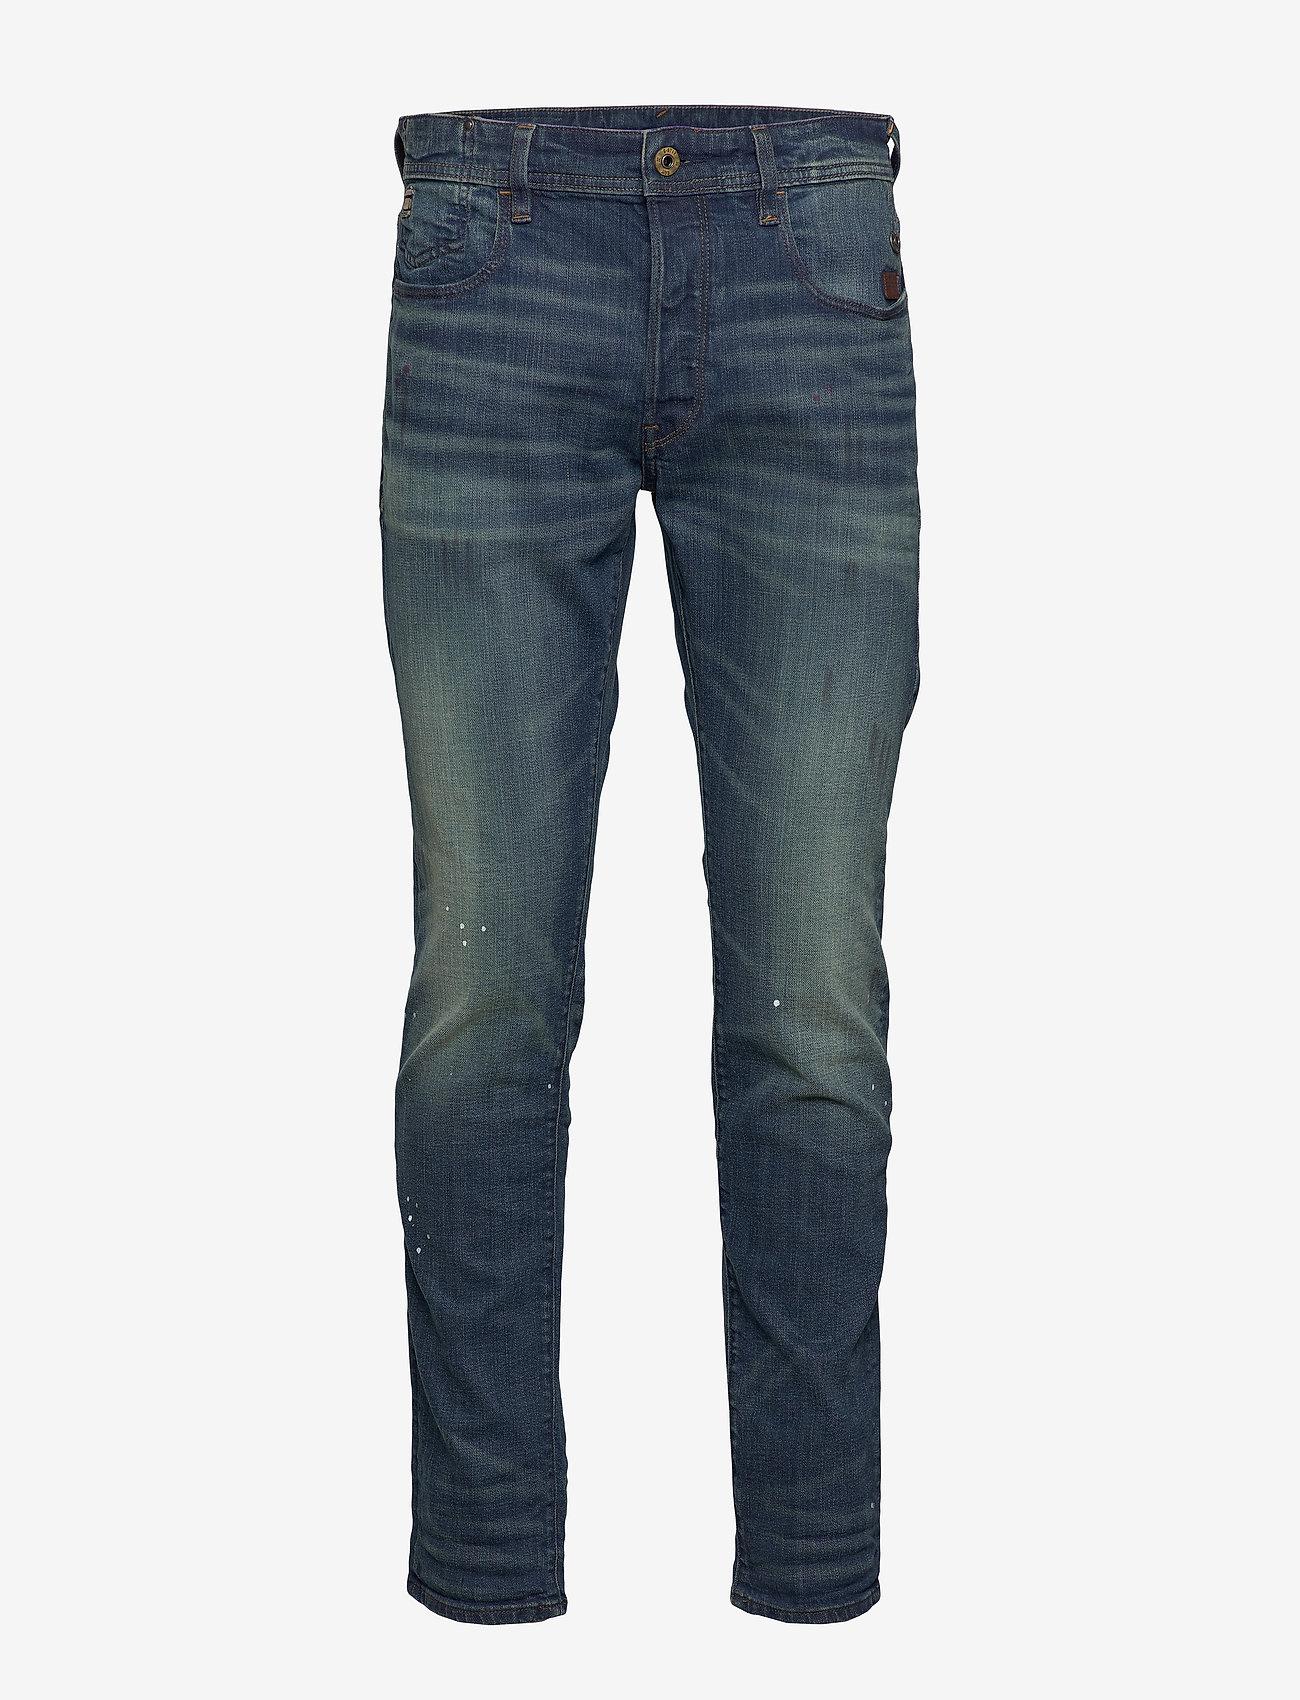 G-star RAW - G-bleid slim - slim jeans - antic faded lagoon - 0